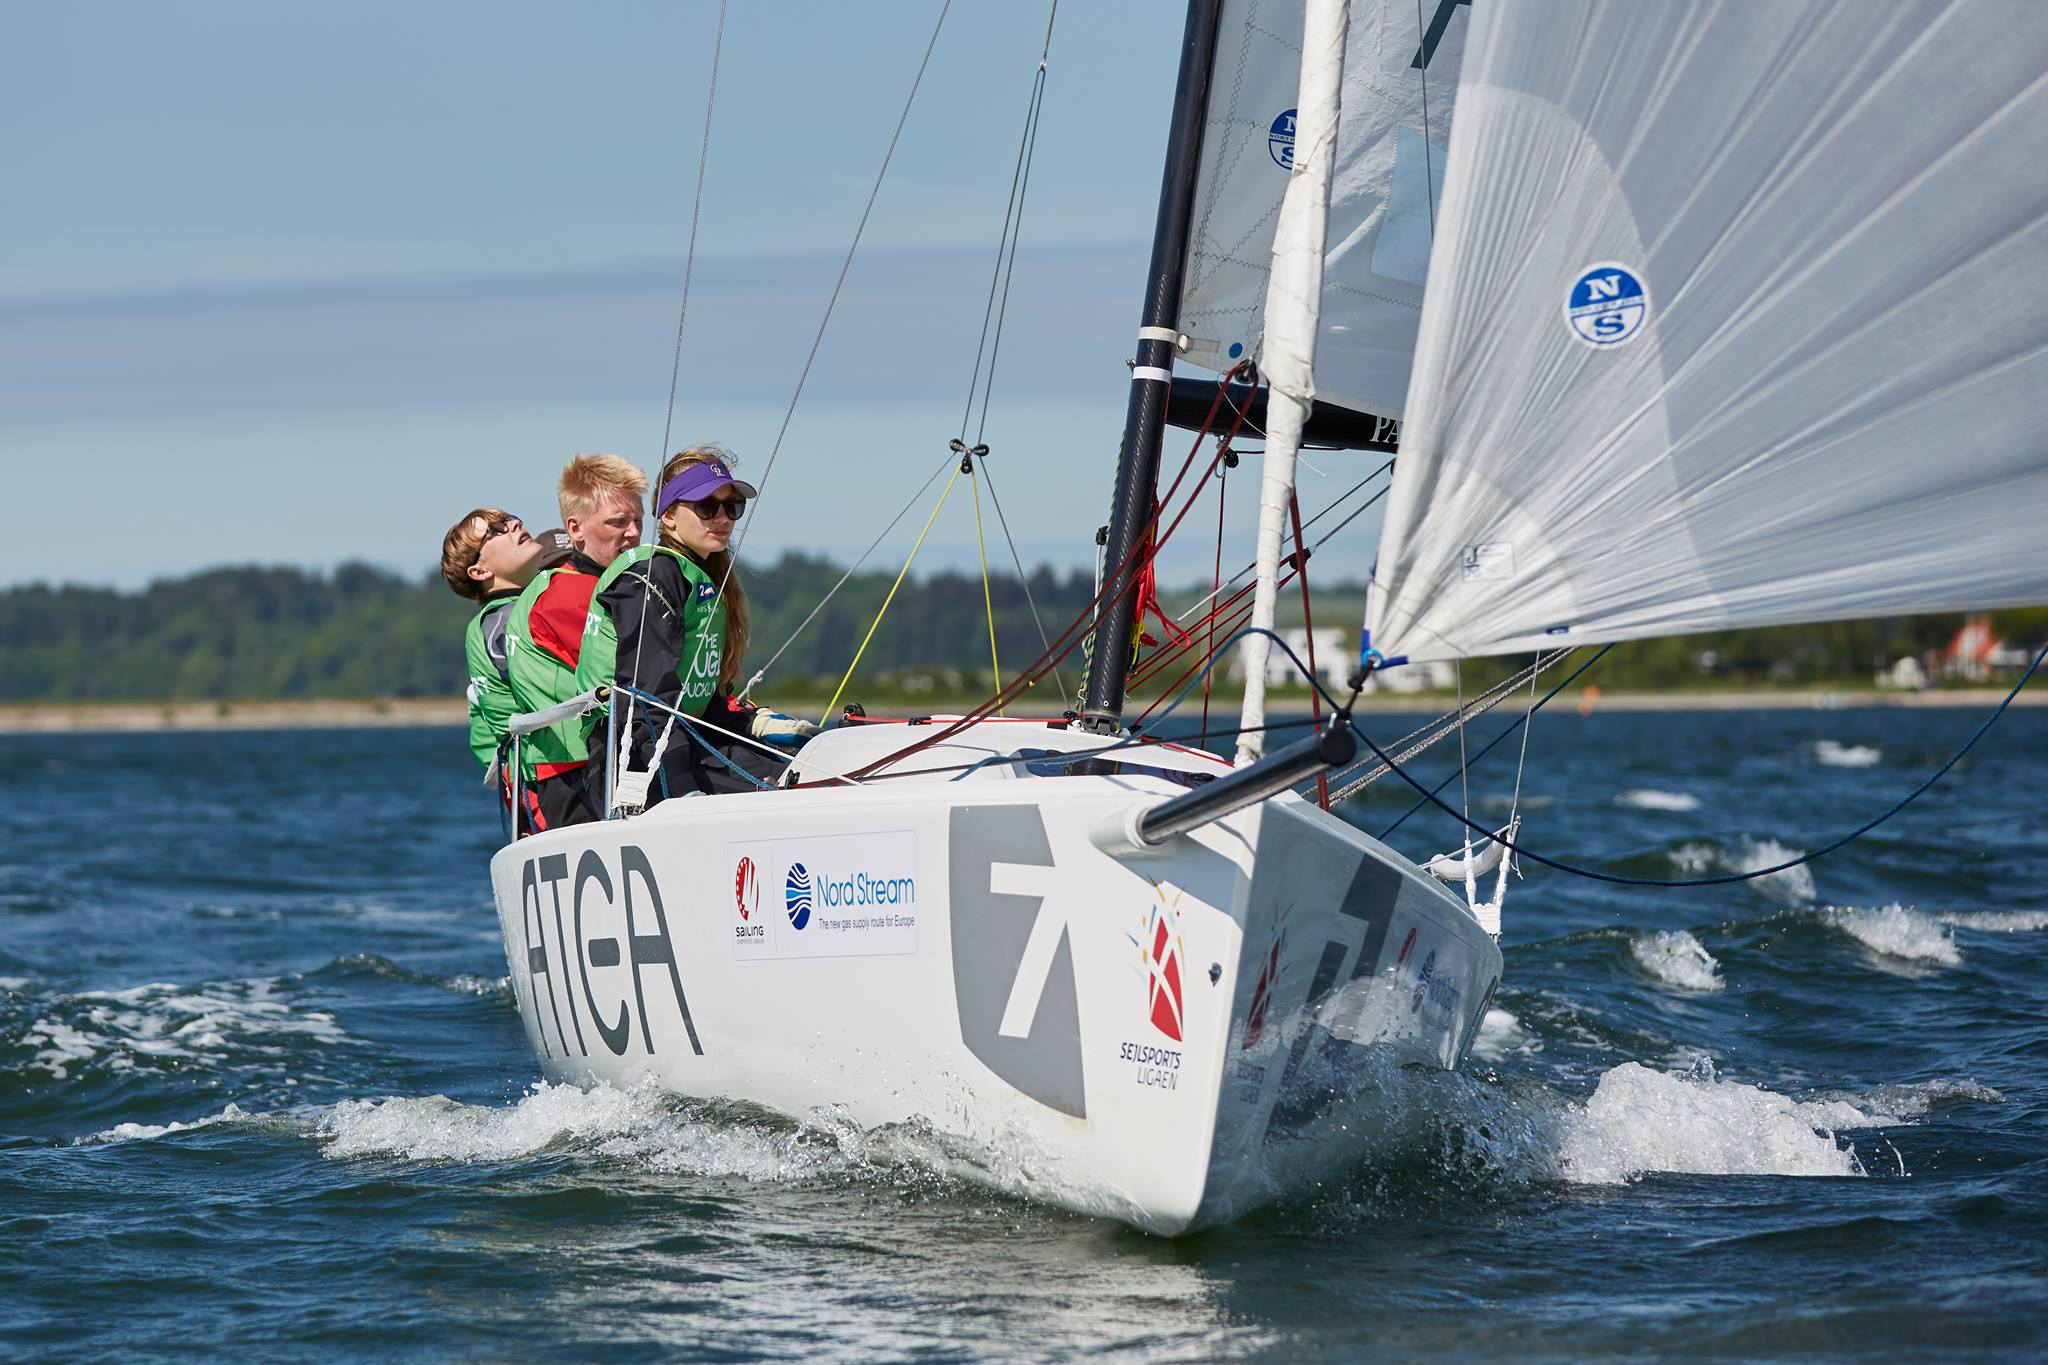 Oures 2. divisions team. Foto: Frederik Sivertsen